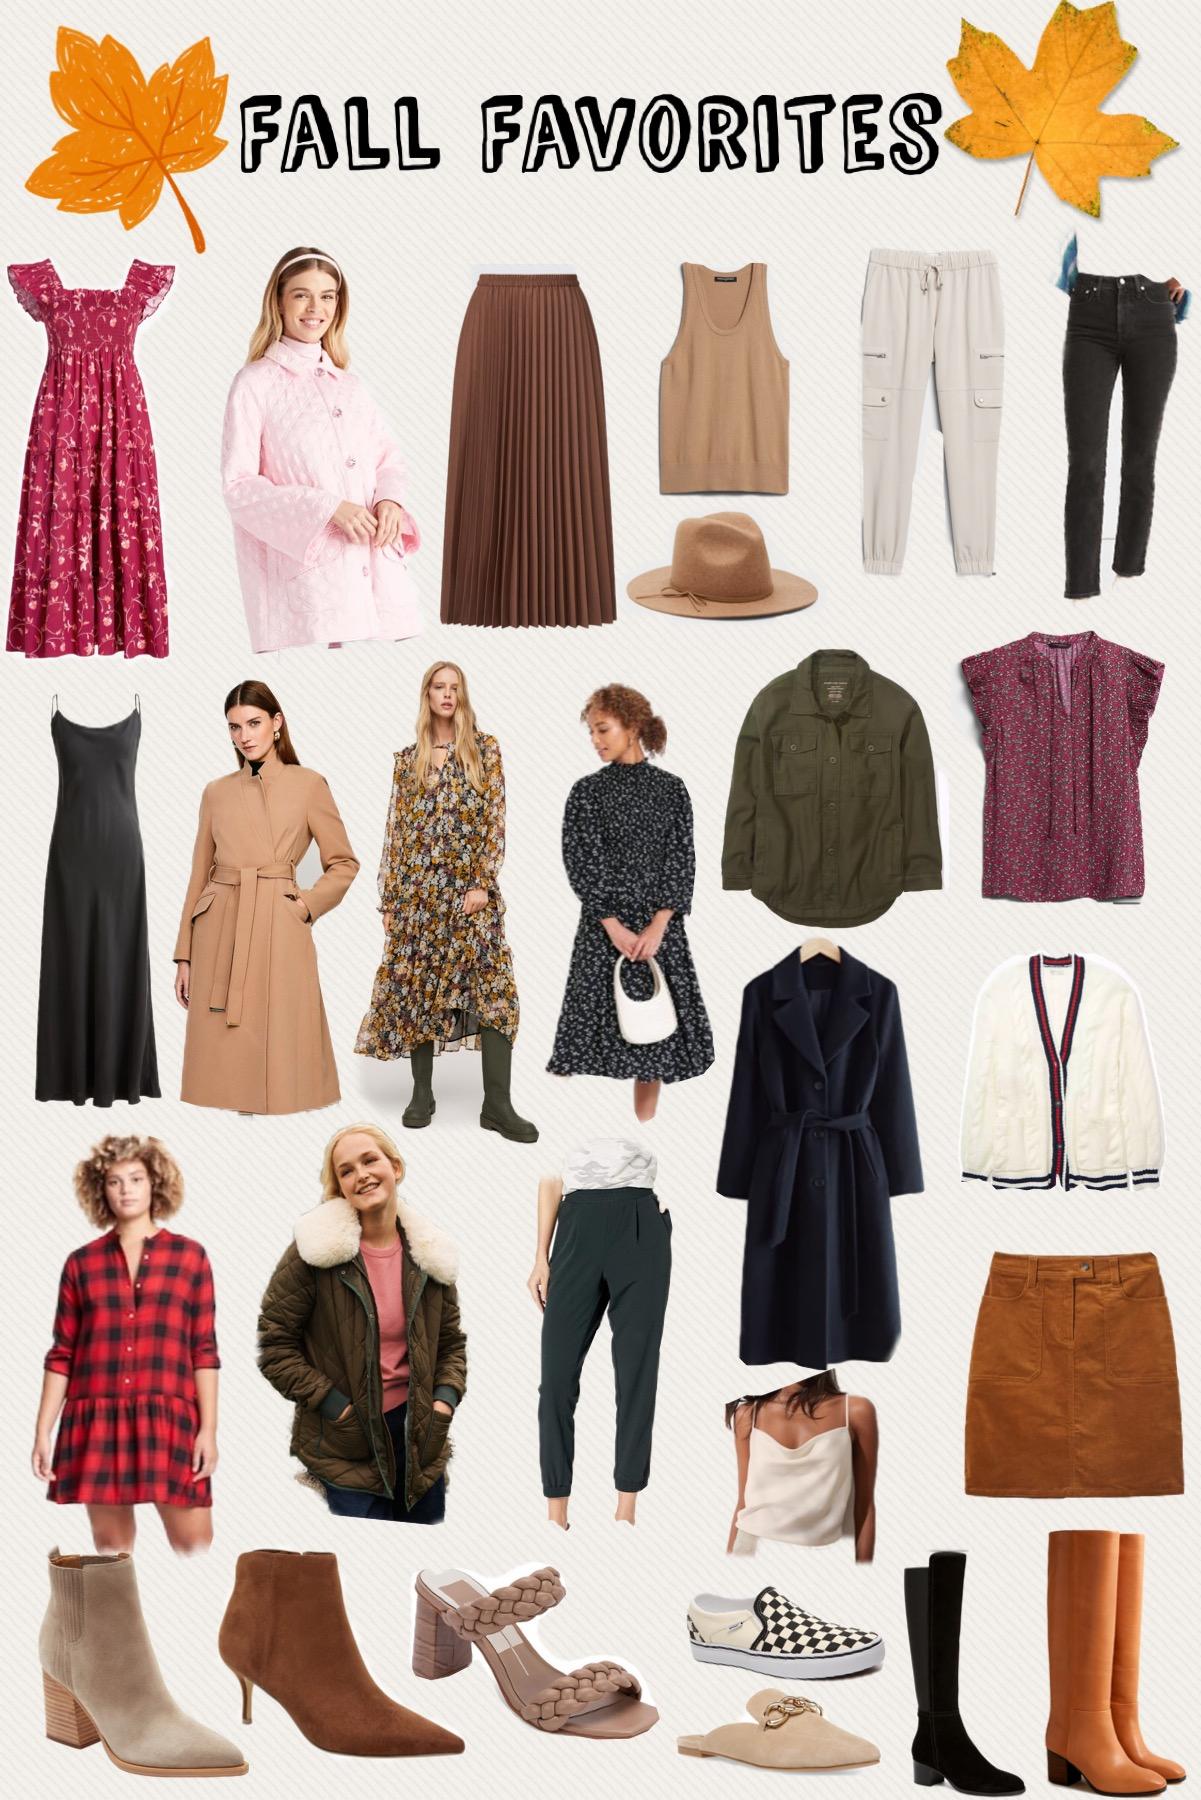 Fall Fashion trend Favorites-2021 by popular mom blog dreaming loud